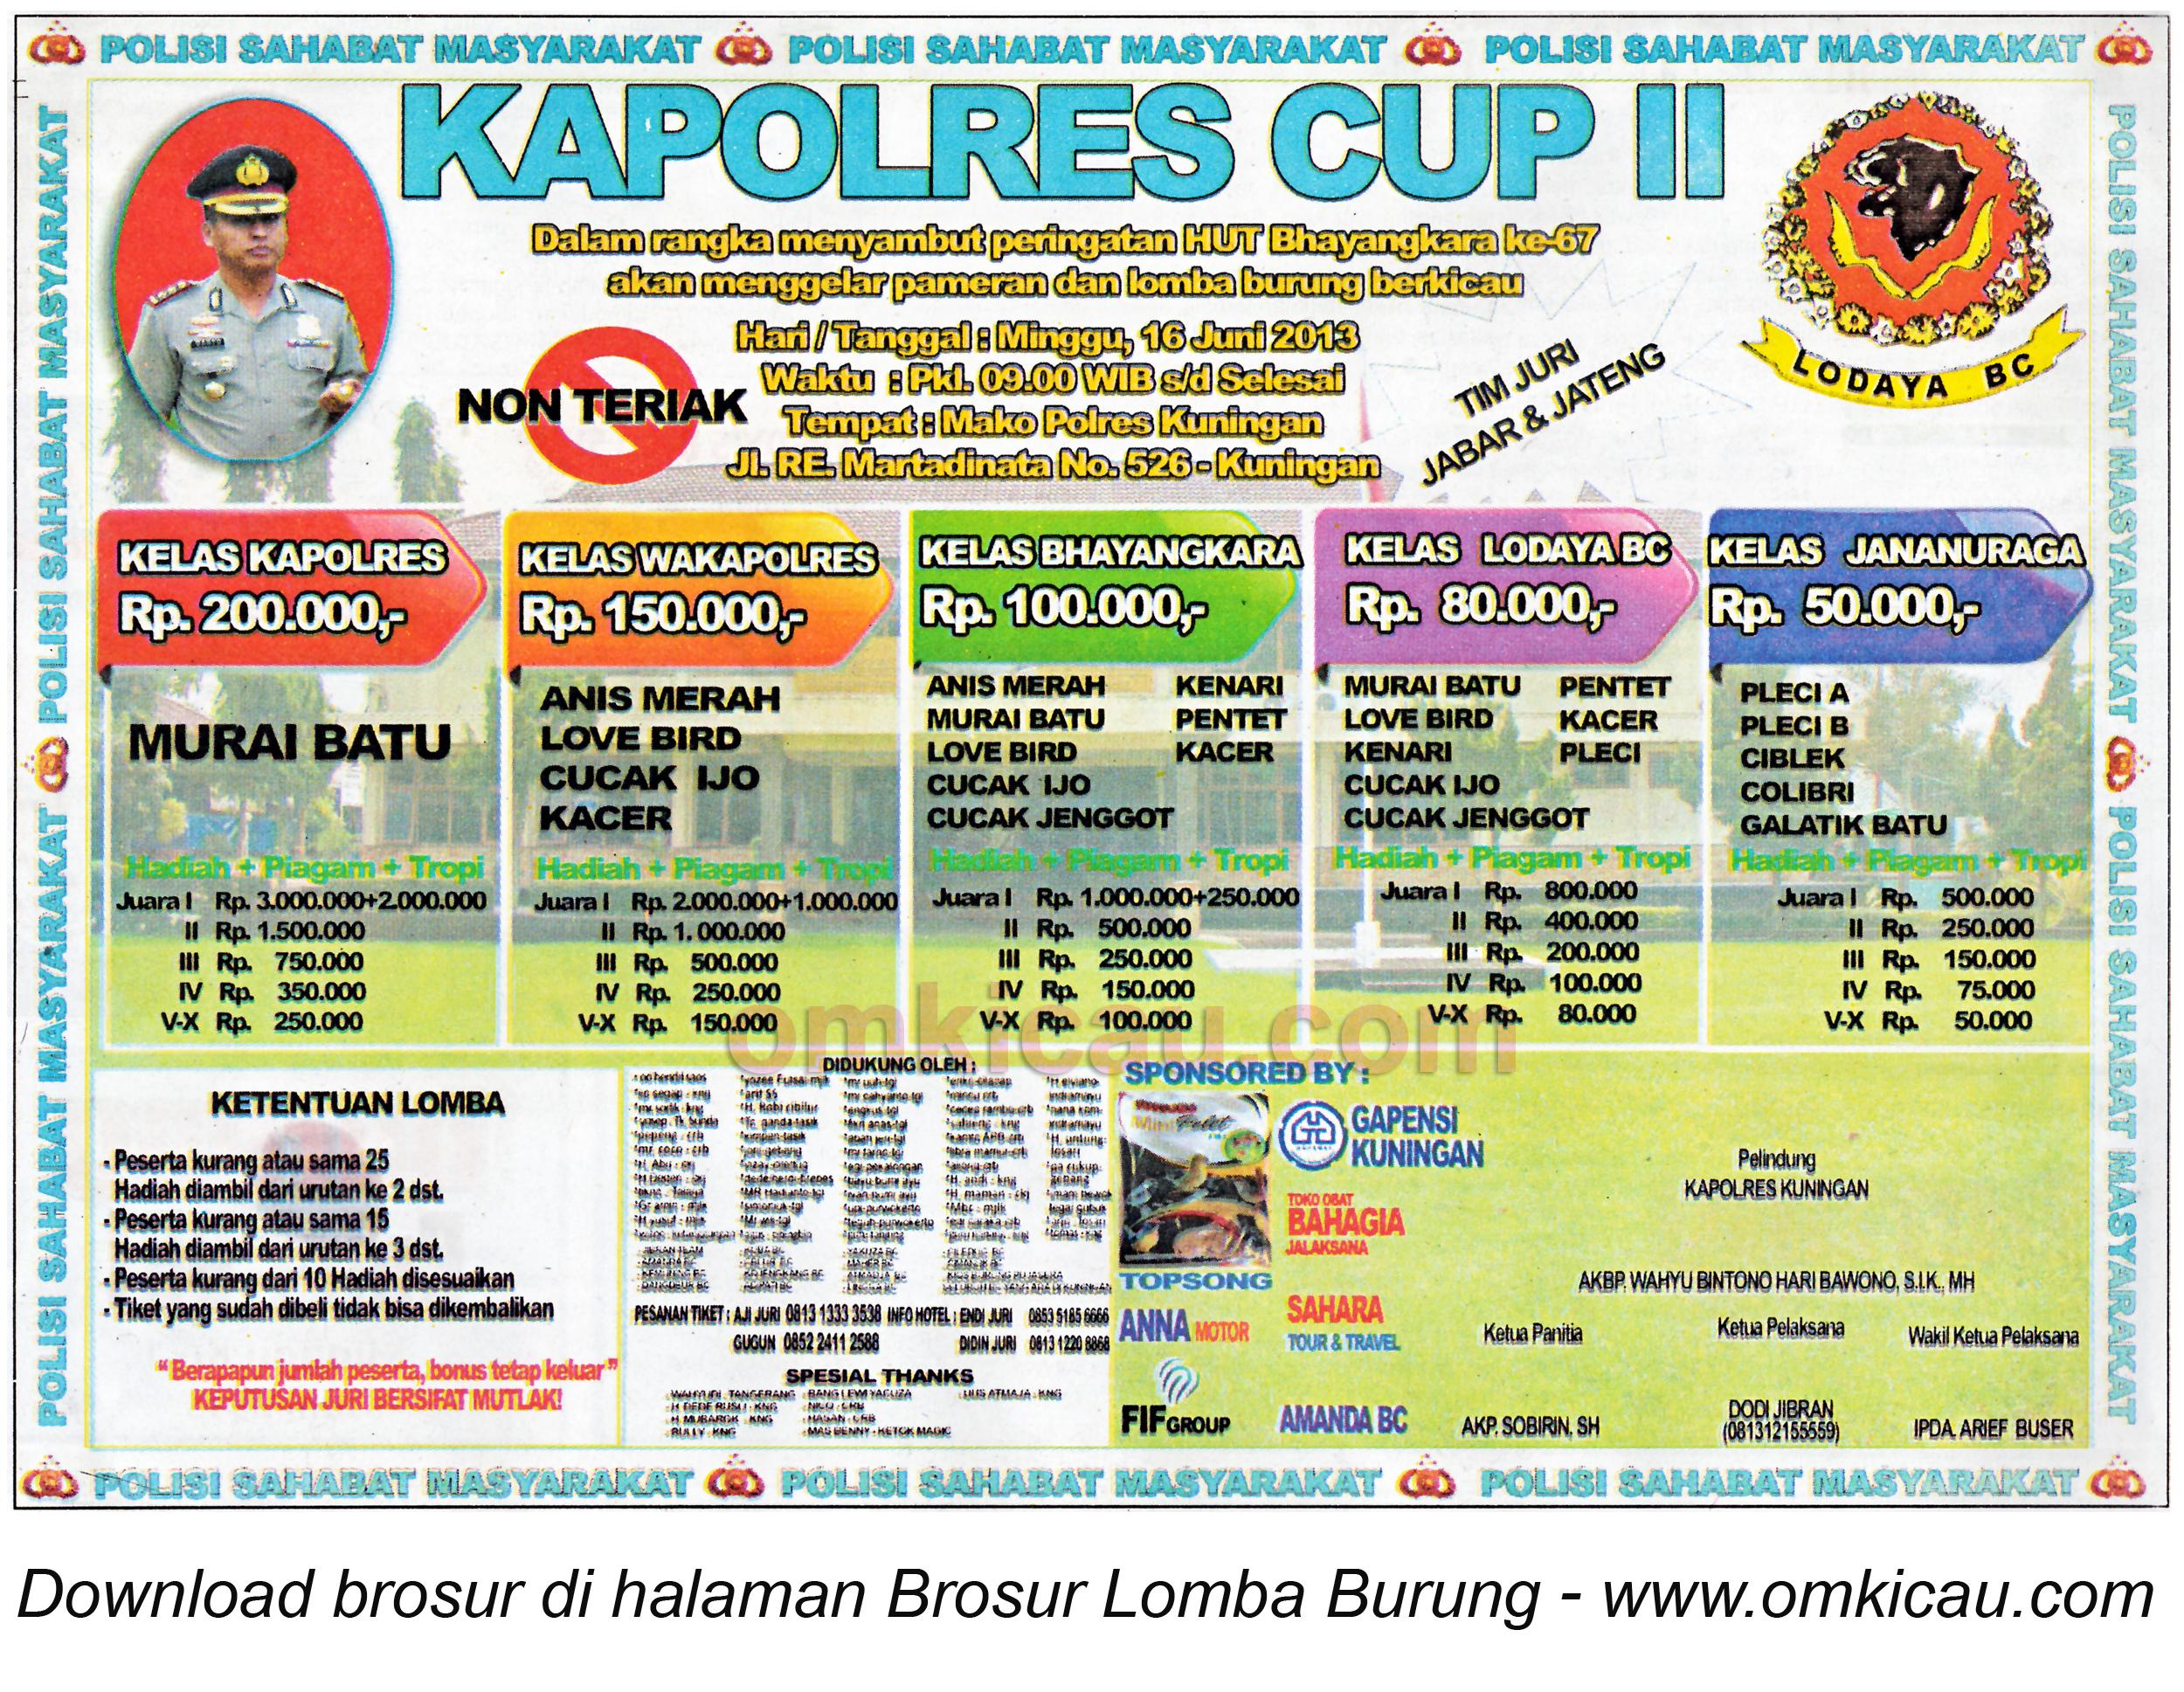 Brosur Lomba Burung Kapolres Cup II Kuningan